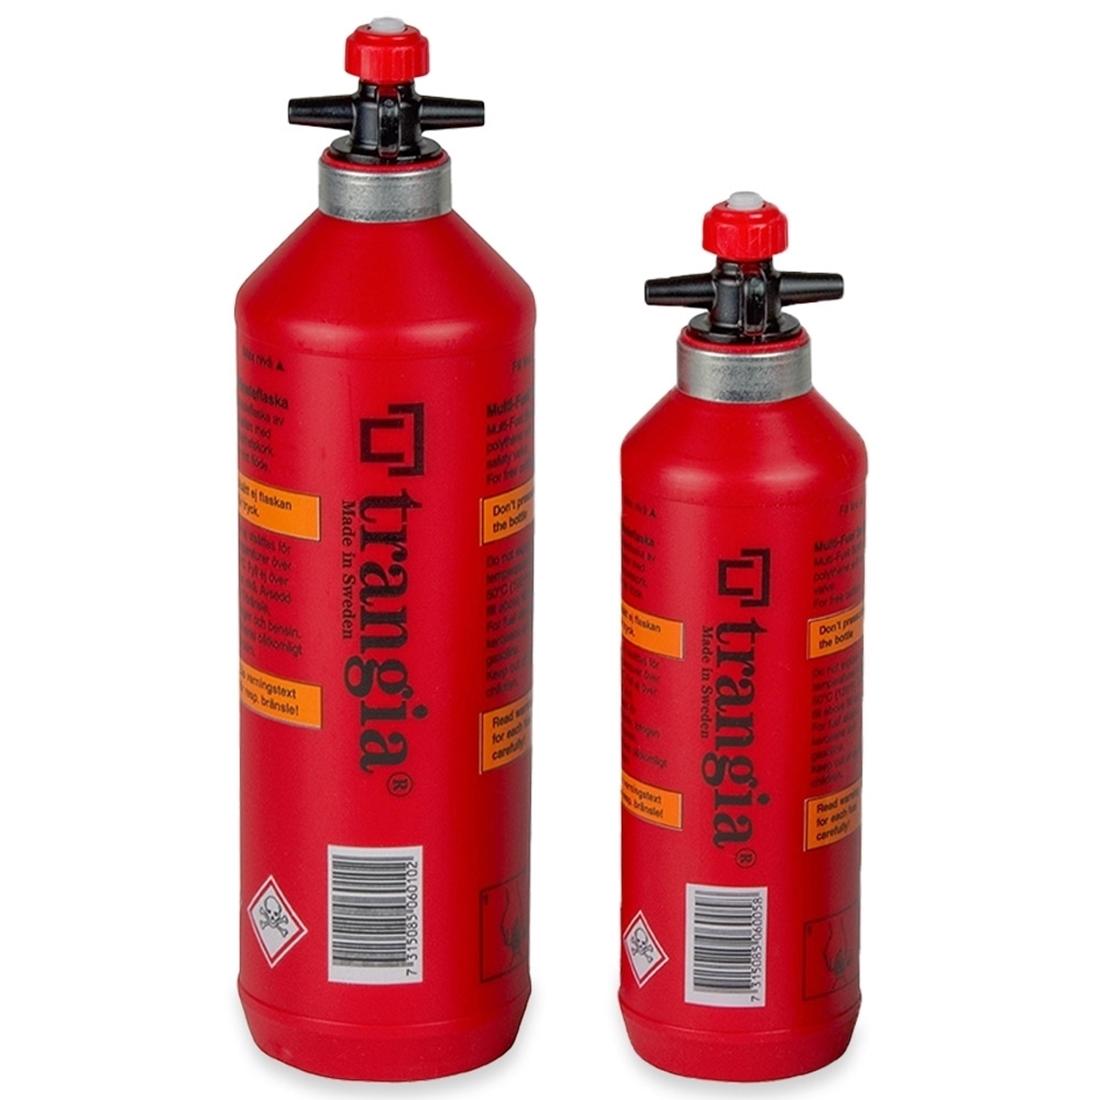 Trangia Multi Fuel Bottles - 500mL and 1L